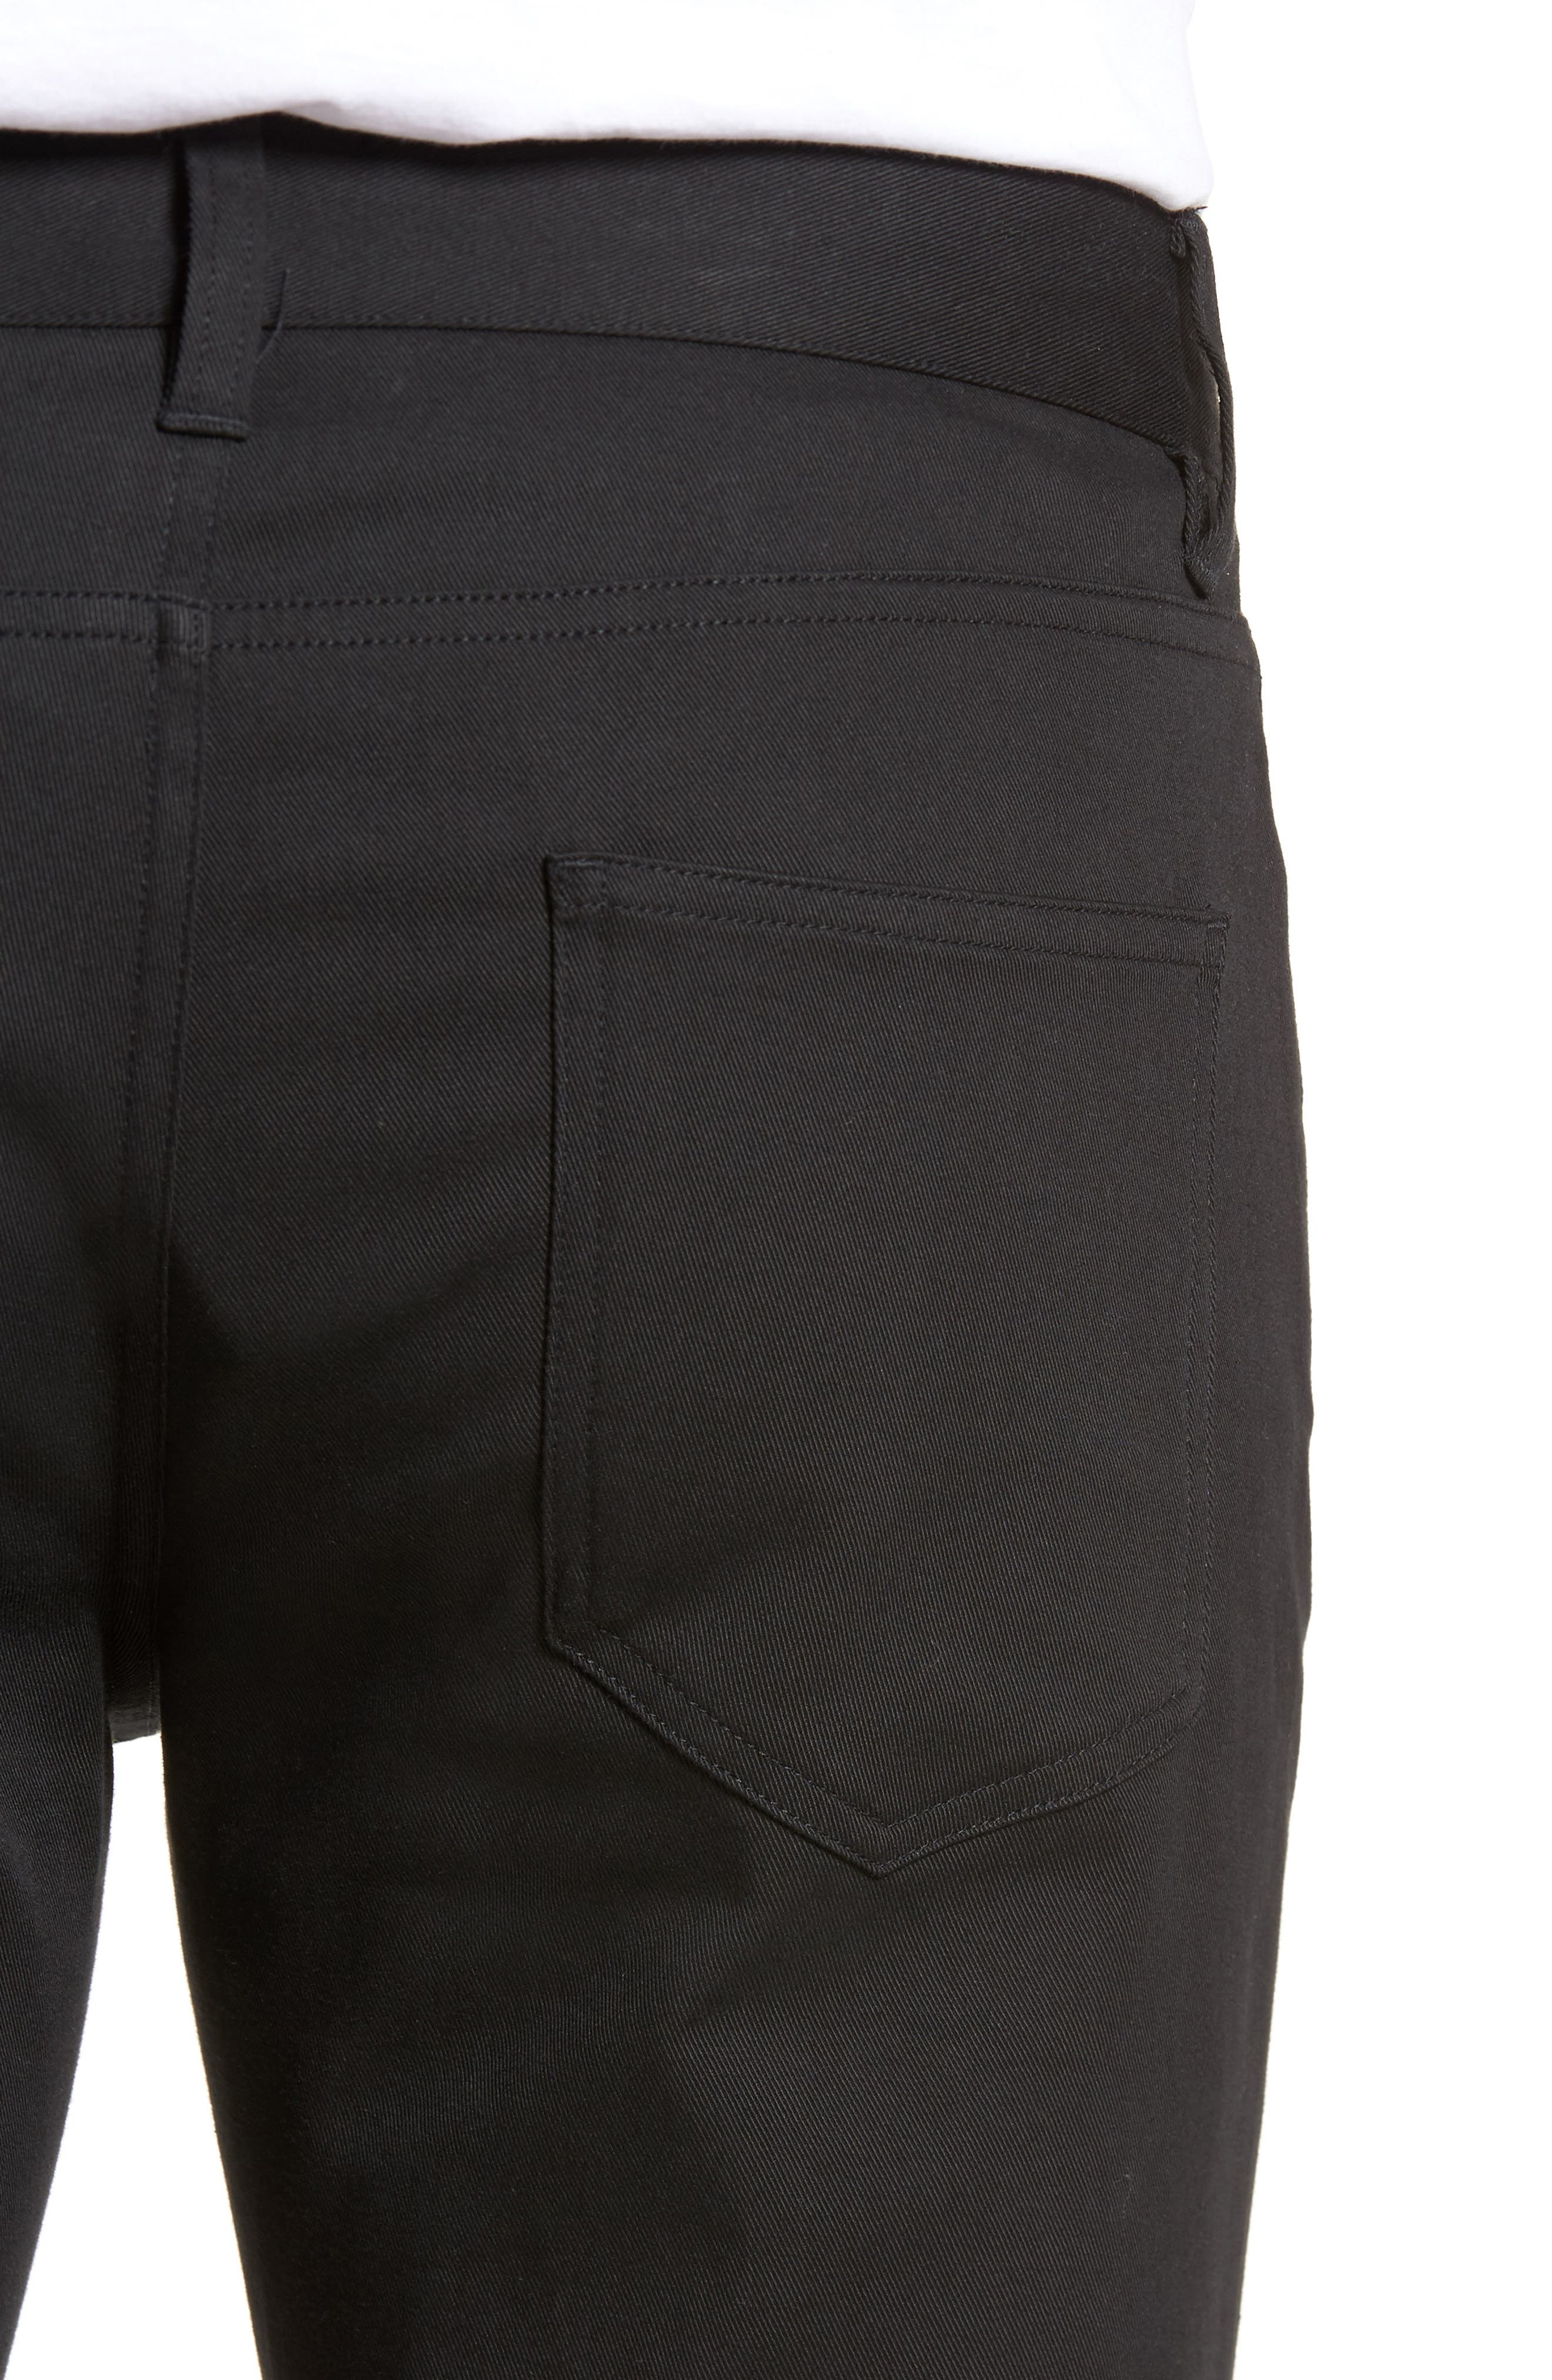 Skinny Slim Fit Pants,                             Alternate thumbnail 4, color,                             001